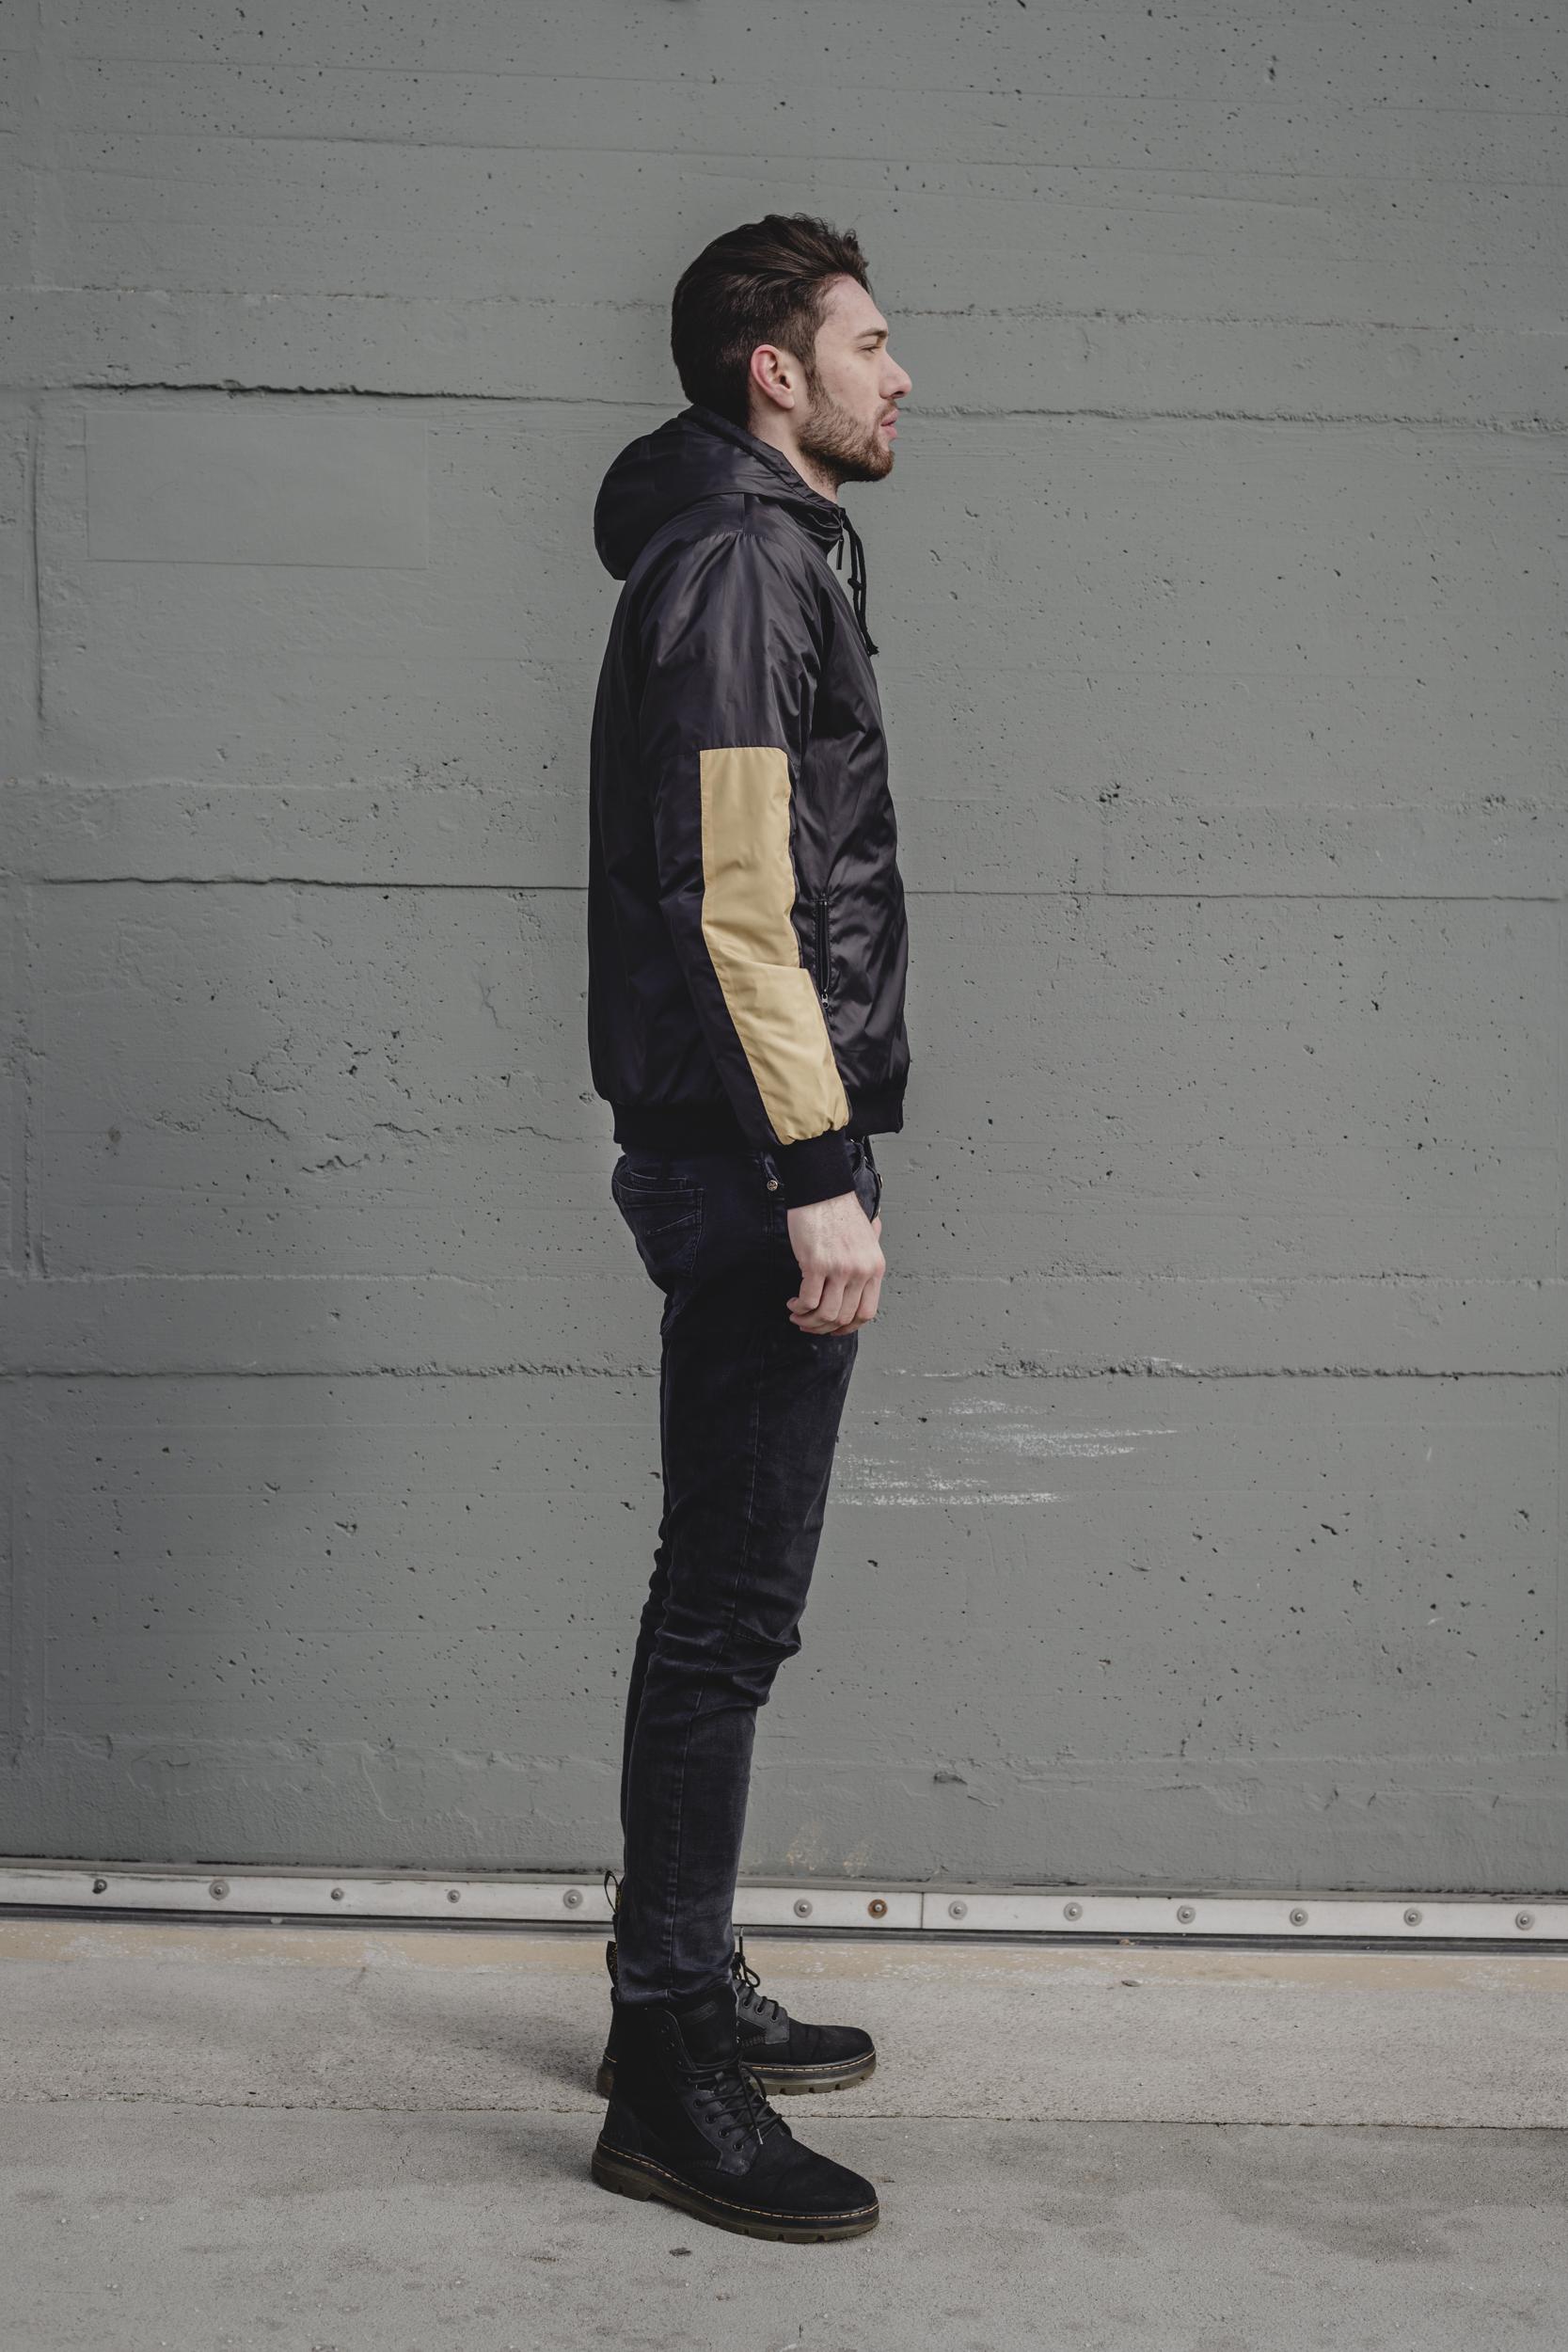 TT_fw2018_jackets_gsx5975.jpg